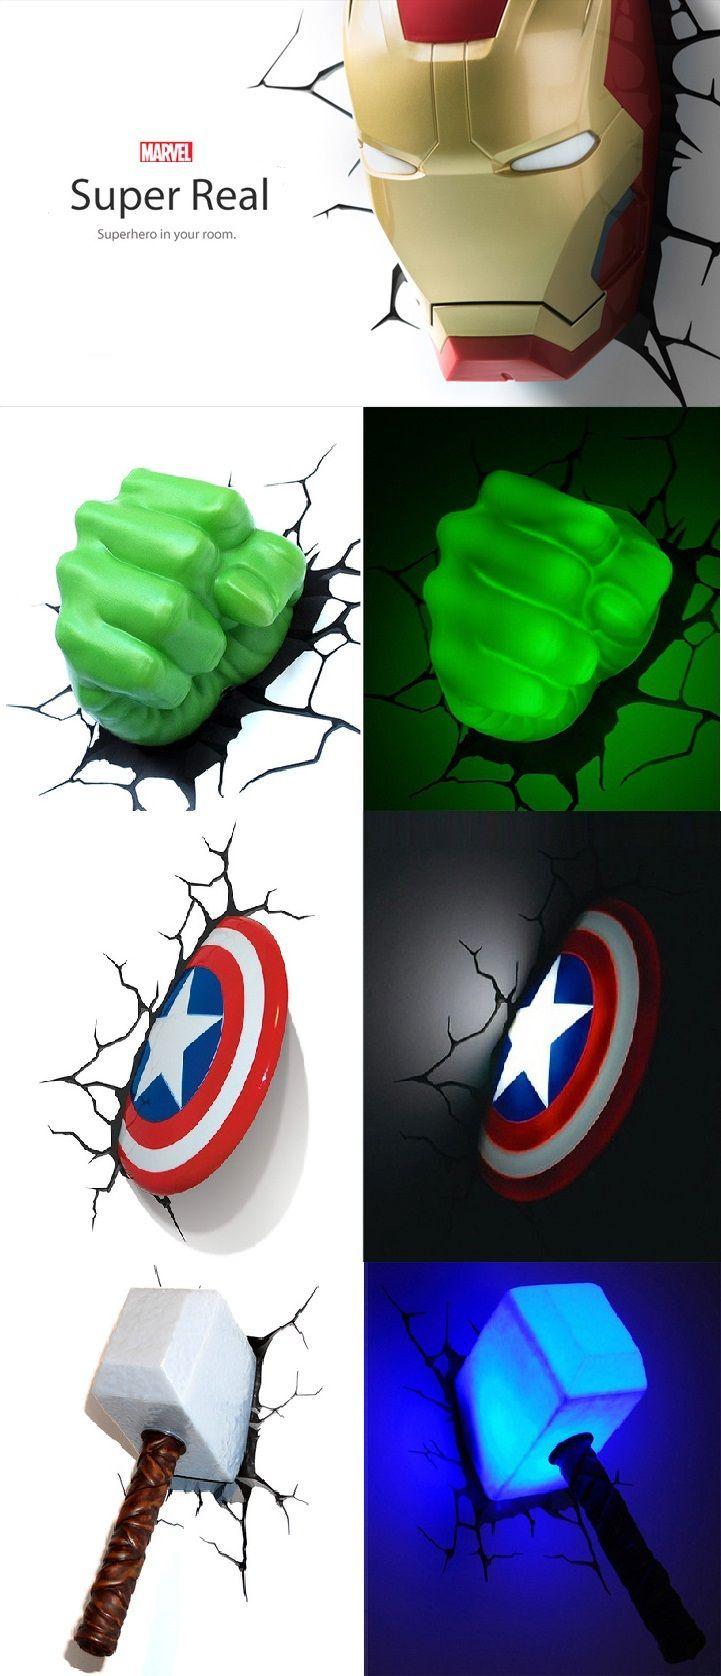 Awesome 3D Marvel Superhero Nightlights | I <3 Products | Pinterest ...